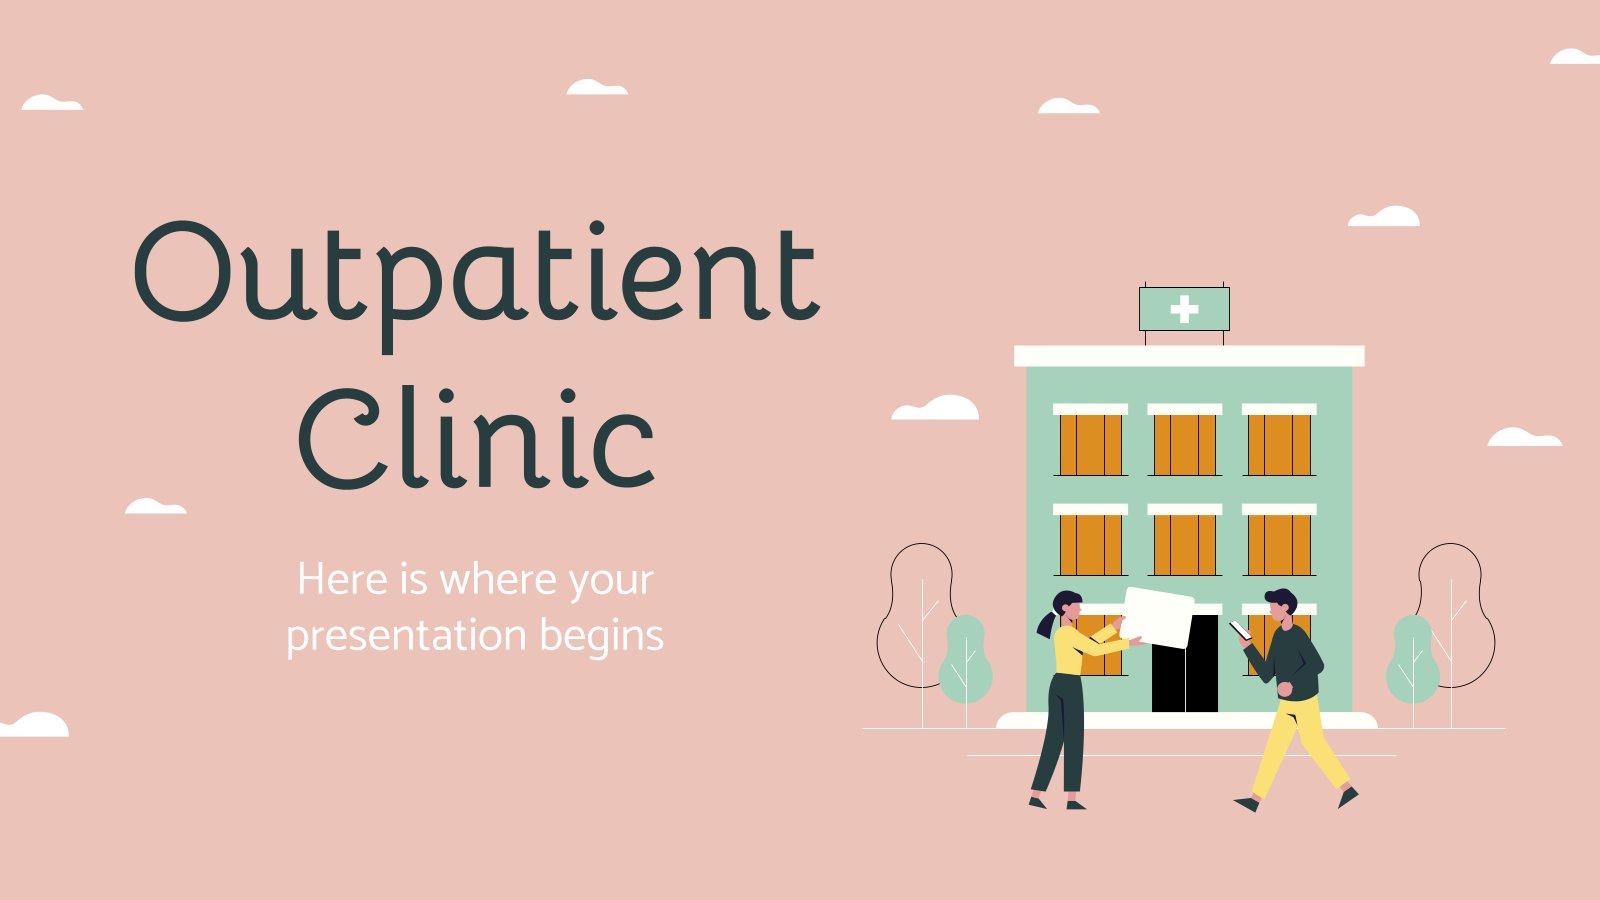 Outpatient Clinic presentation template